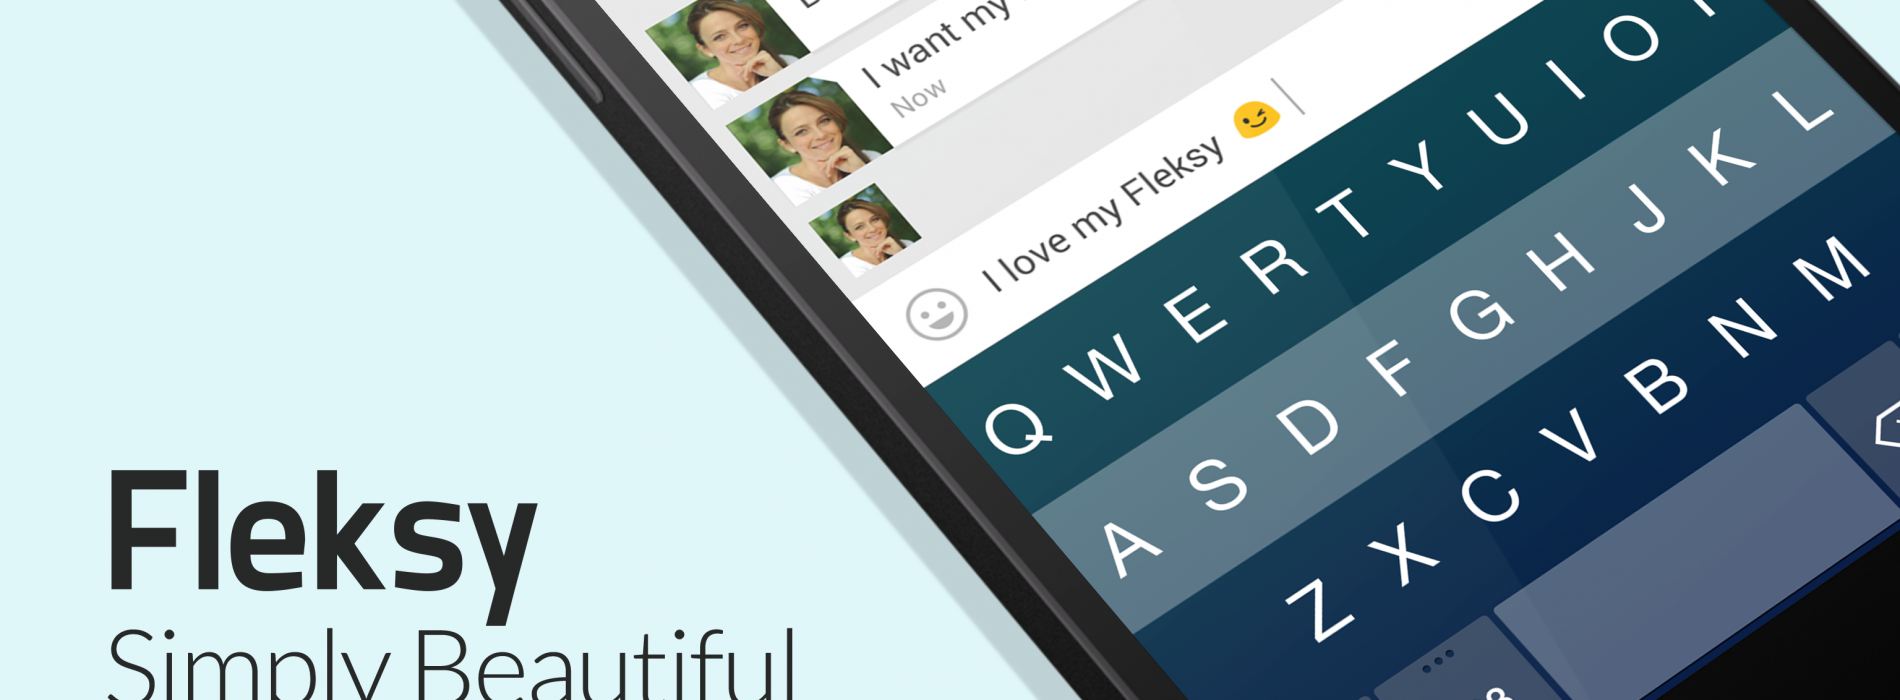 Fleksy Keyboard announces partnership with Sprint App Pass